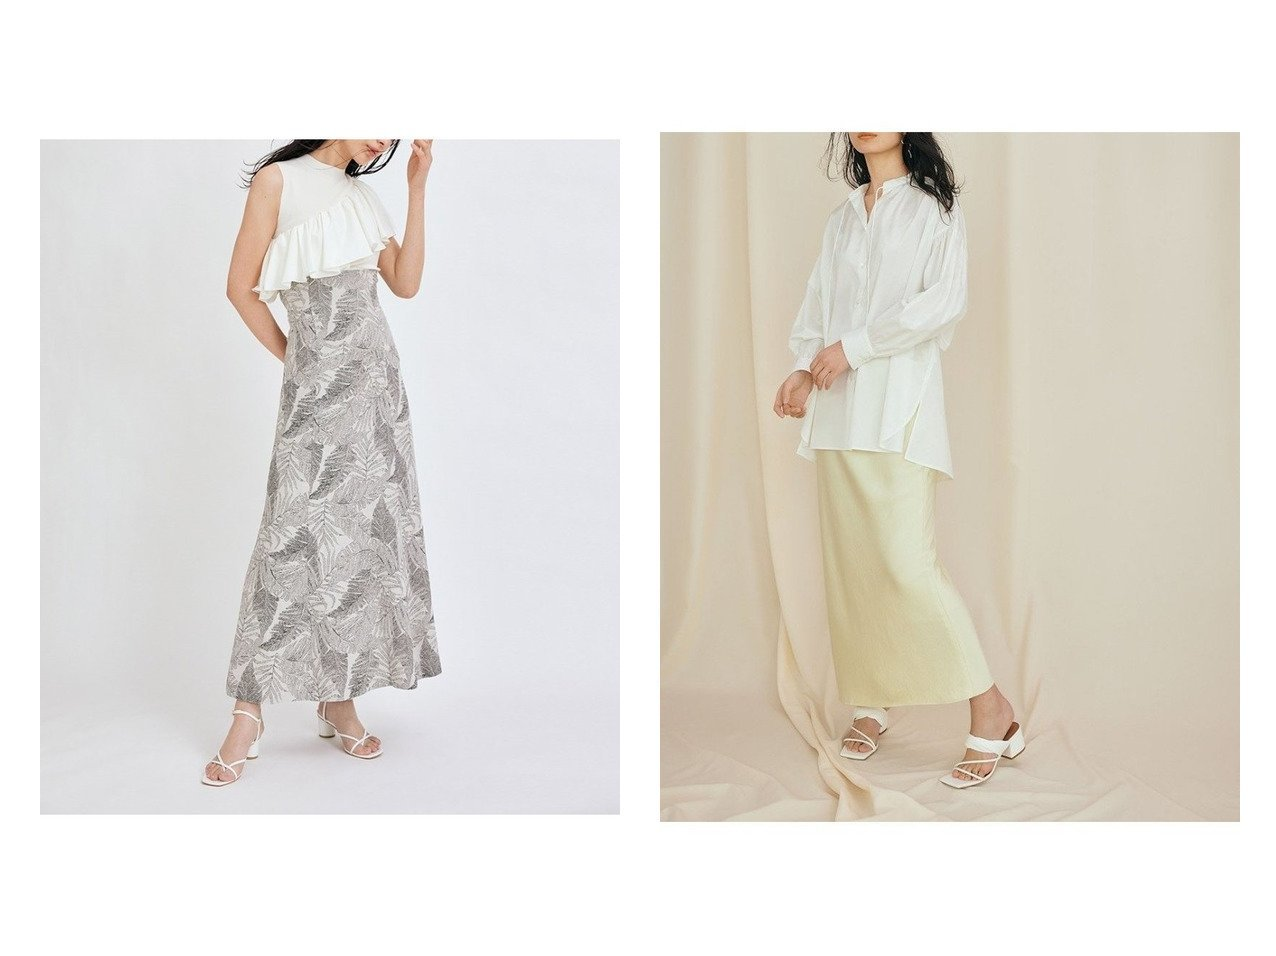 【FRAY I.D/フレイ アイディー】のサテンロングスカート&リーフジャガードナロースカート 【スカート】おすすめ!人気、トレンド・レディースファッションの通販 おすすめで人気の流行・トレンド、ファッションの通販商品 インテリア・家具・メンズファッション・キッズファッション・レディースファッション・服の通販 founy(ファニー) https://founy.com/ ファッション Fashion レディースファッション WOMEN スカート Skirt ロングスカート Long Skirt コルセット ストレート ヨーク リーフ レース ロング サテン バイアス ヴィンテージ |ID:crp329100000045121